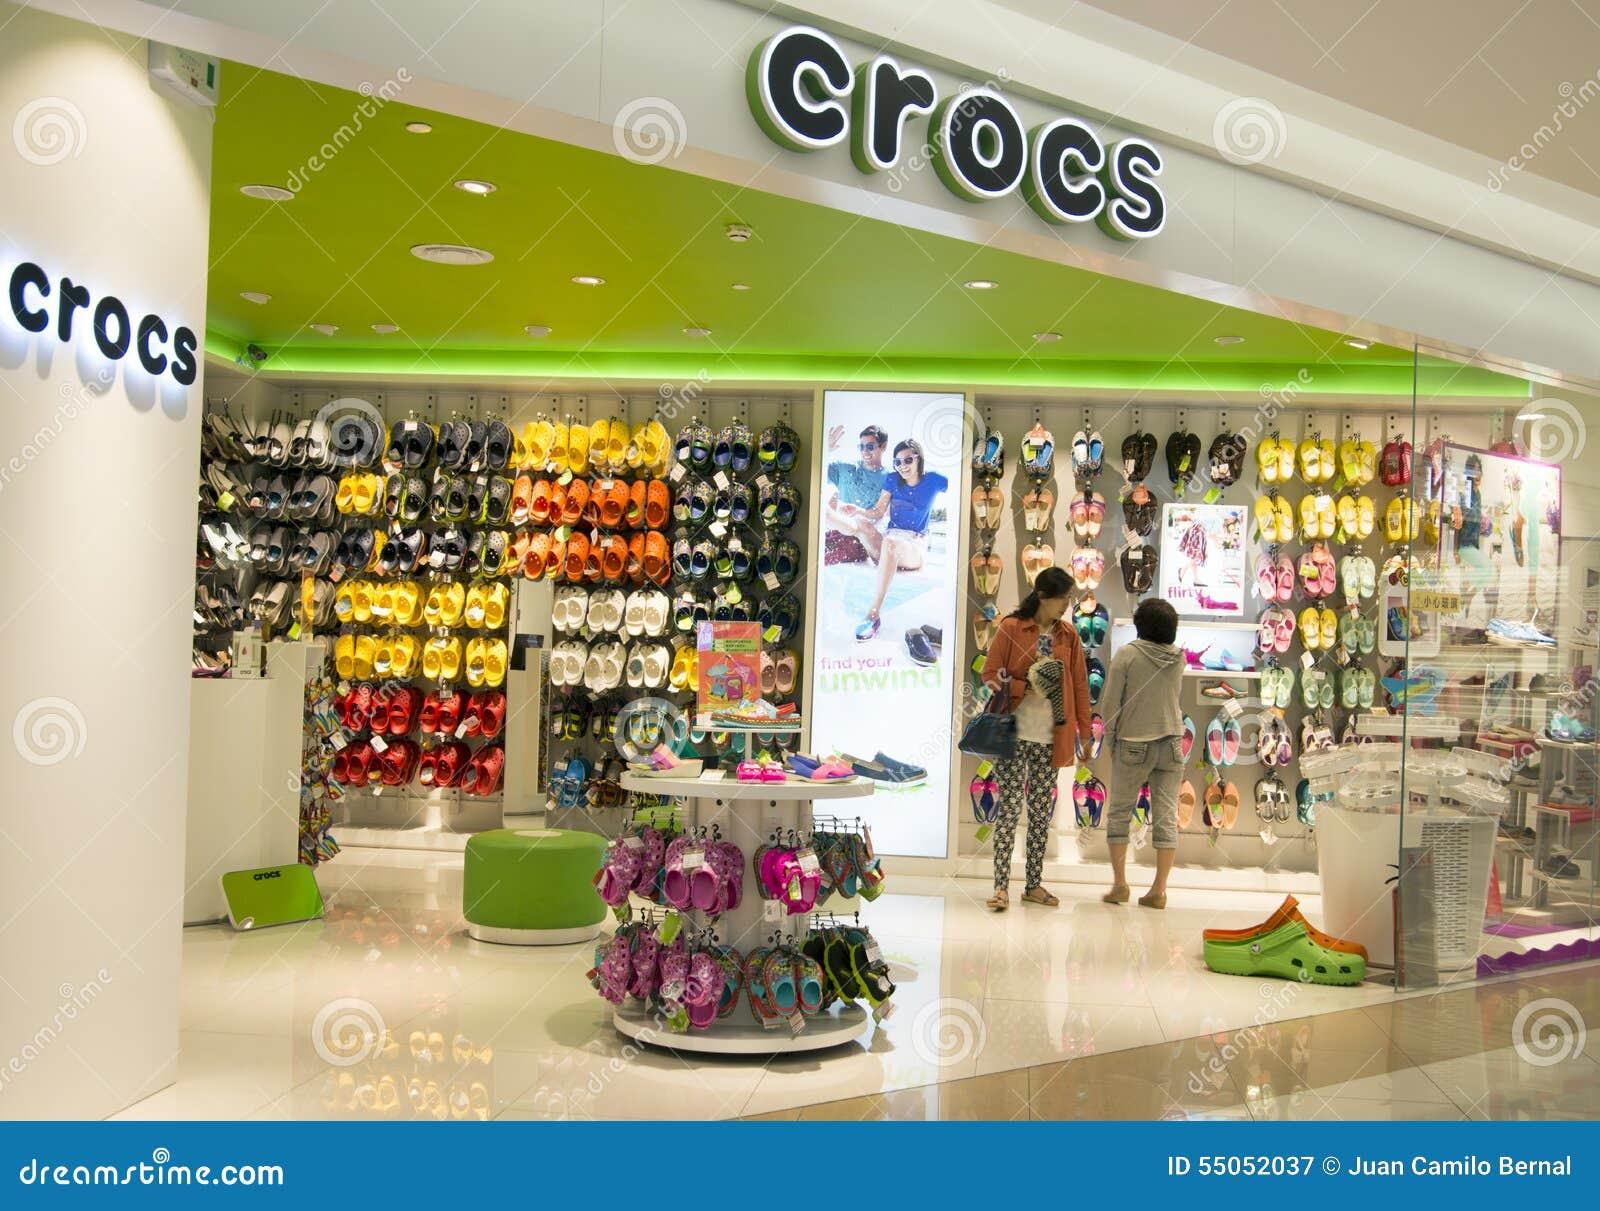 7eb61d535cb3d7 Crocs Store Inside A Shopping Mall In Hangzhou